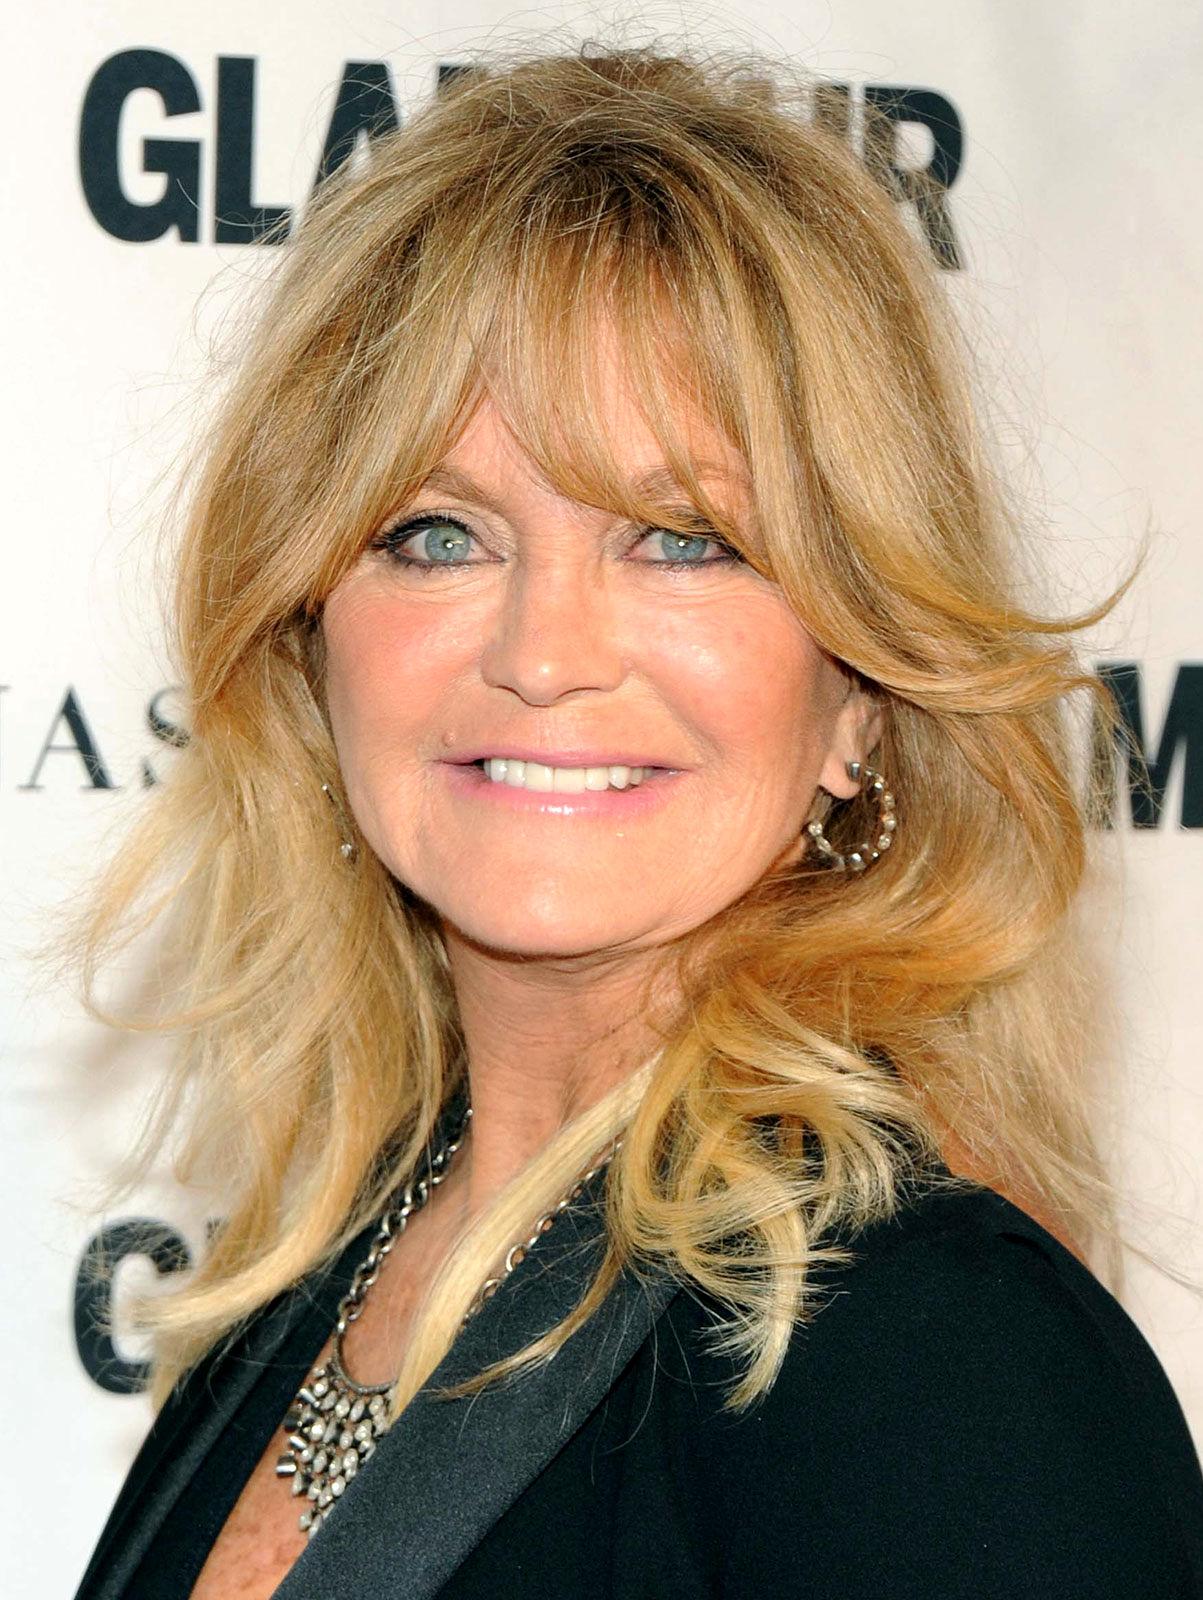 Goldie Hawn | Biography, Movies, & Facts | Britannica